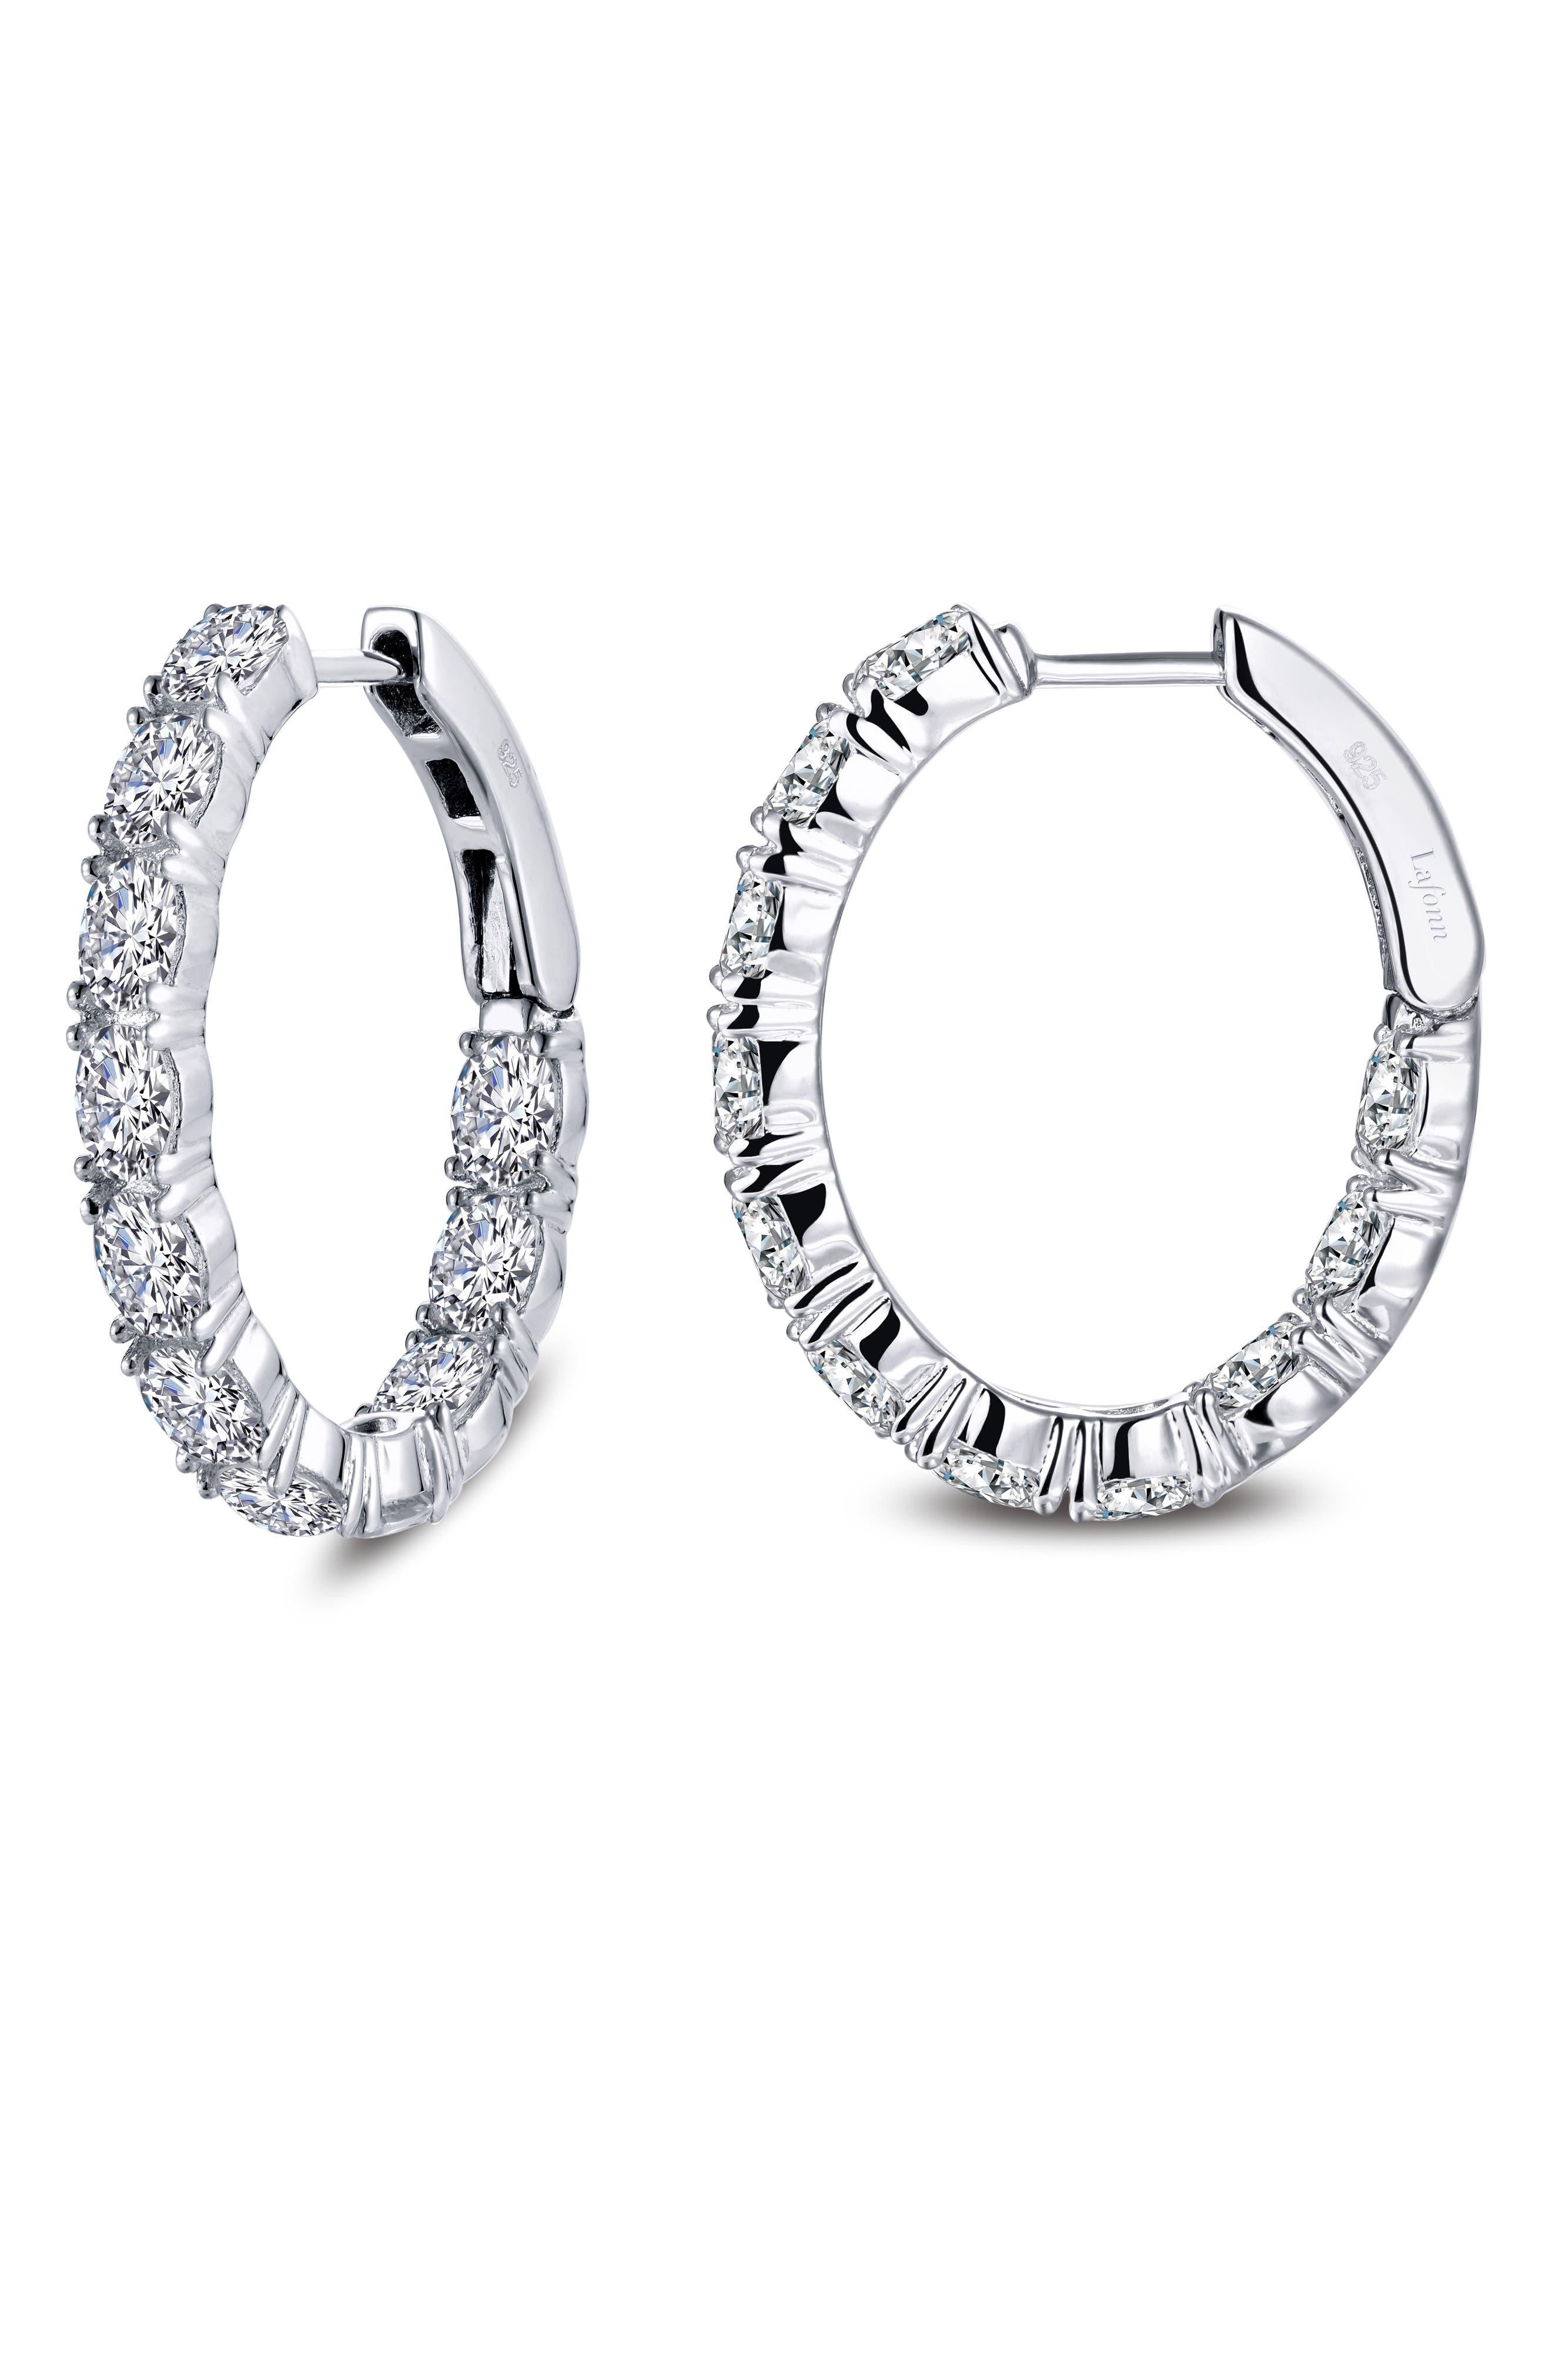 Inside Out Simulated Diamond Oval Hoop Earrings